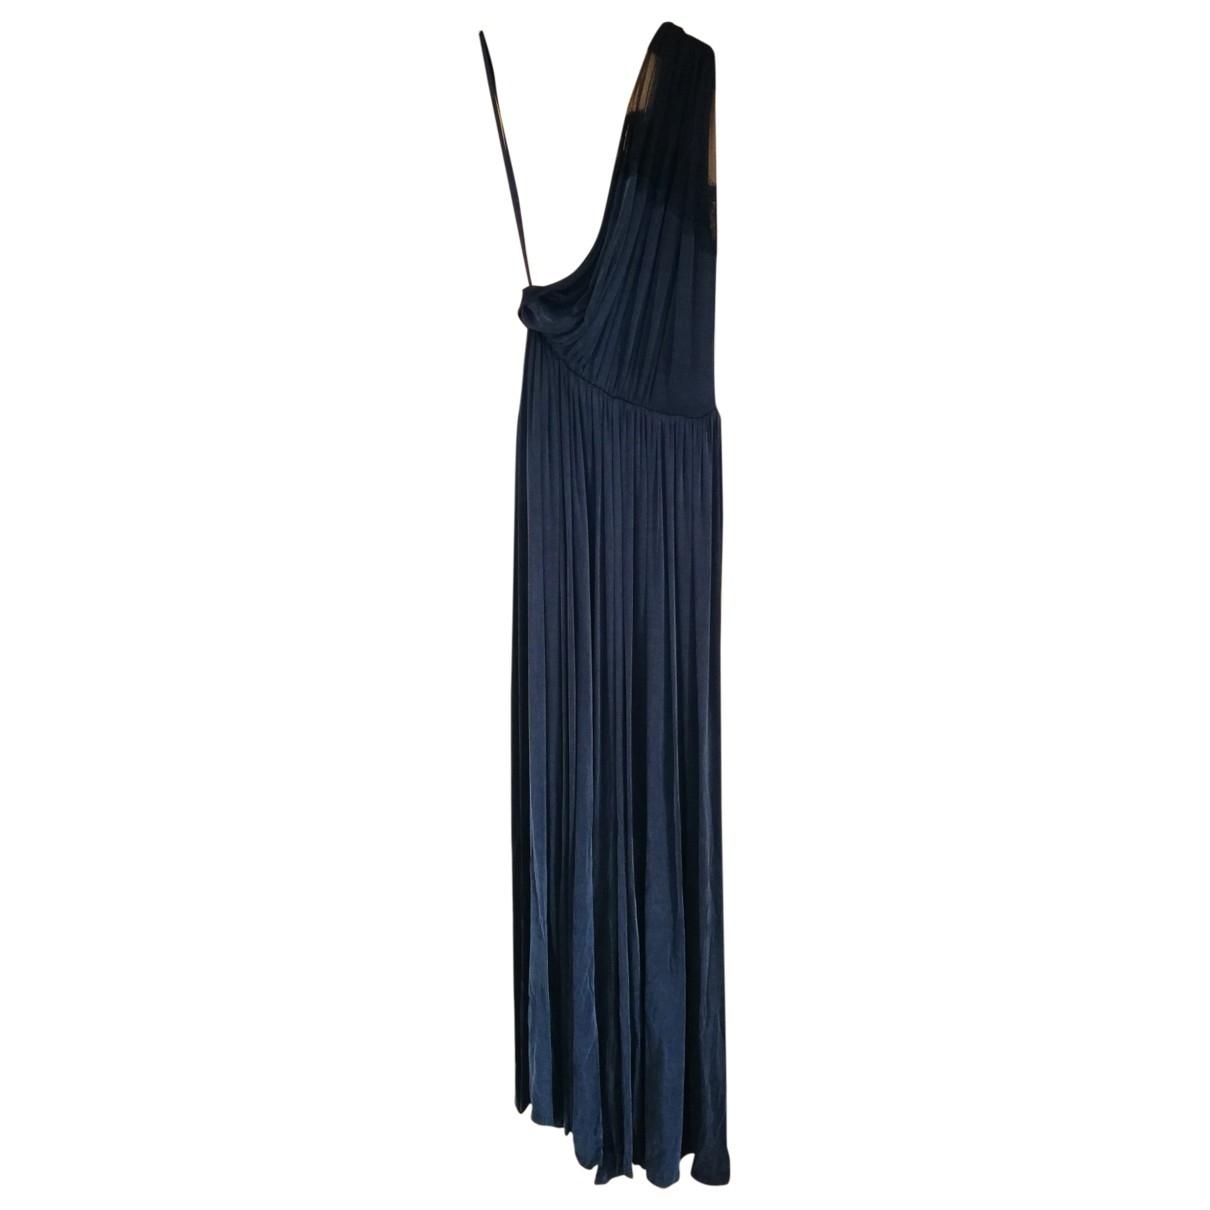 Elisabetta Franchi \N Black Cotton dress for Women 44 IT